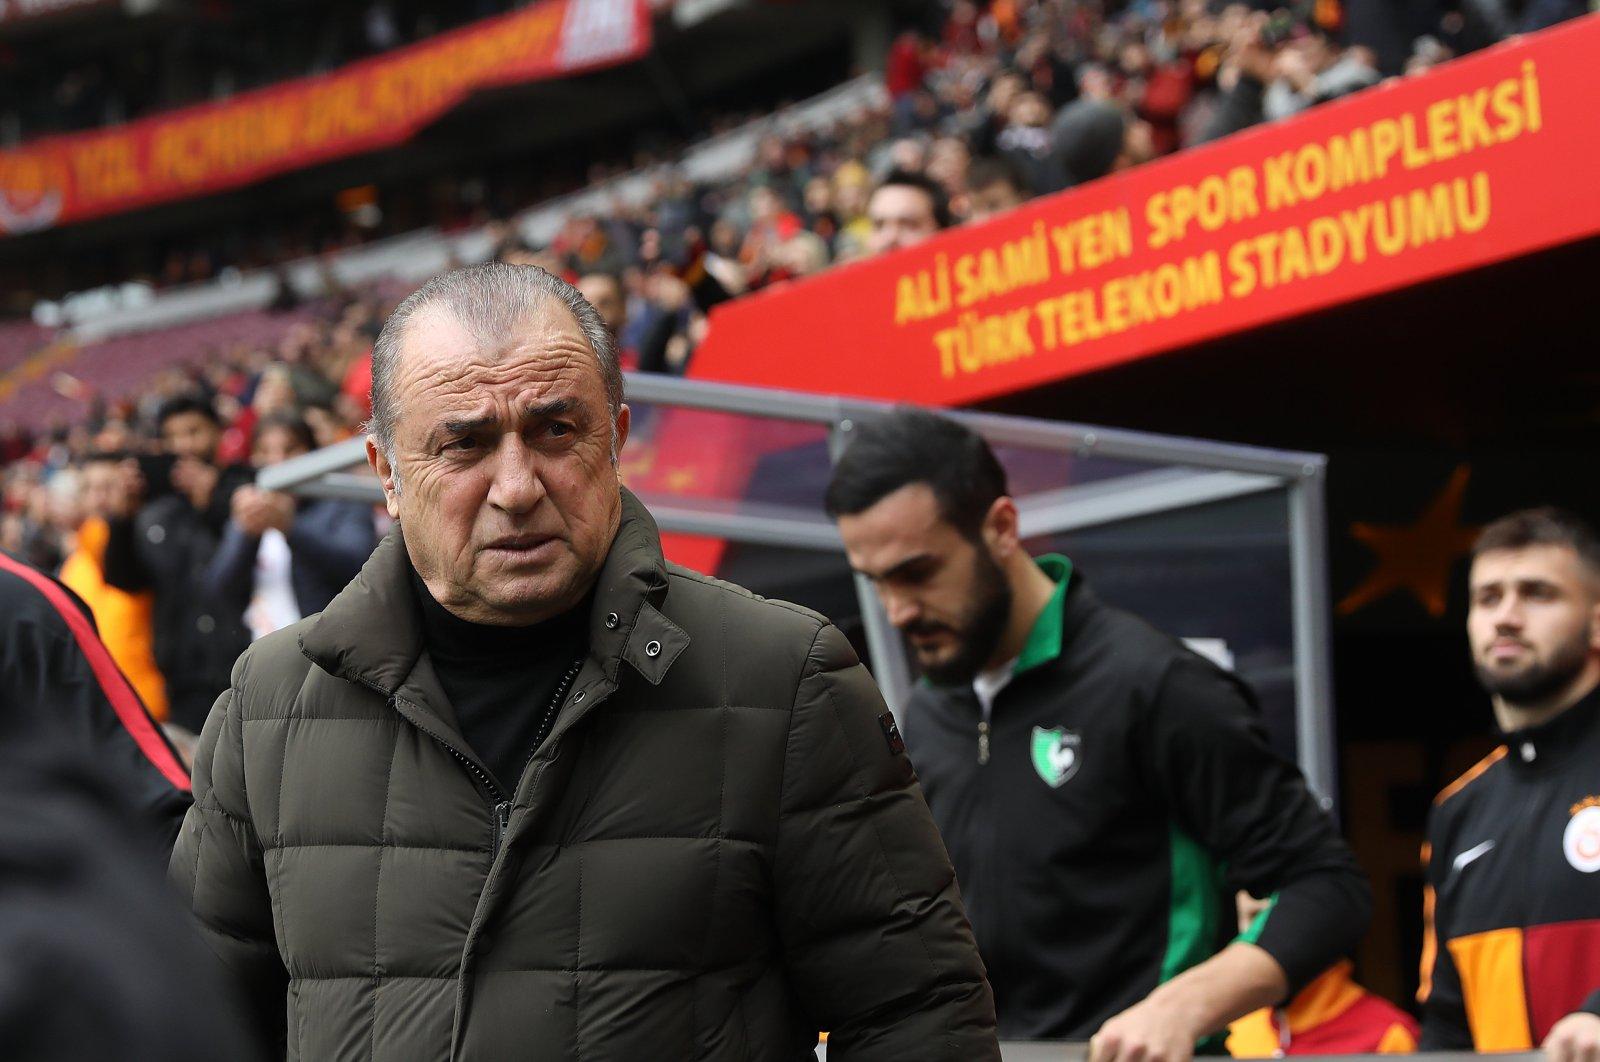 Galatasaray coach Fatih Terim reacts during a Süper Lig match against Denizlispor in Istanbul, Turkey, Jan. 19, 2020. (AA Photo)